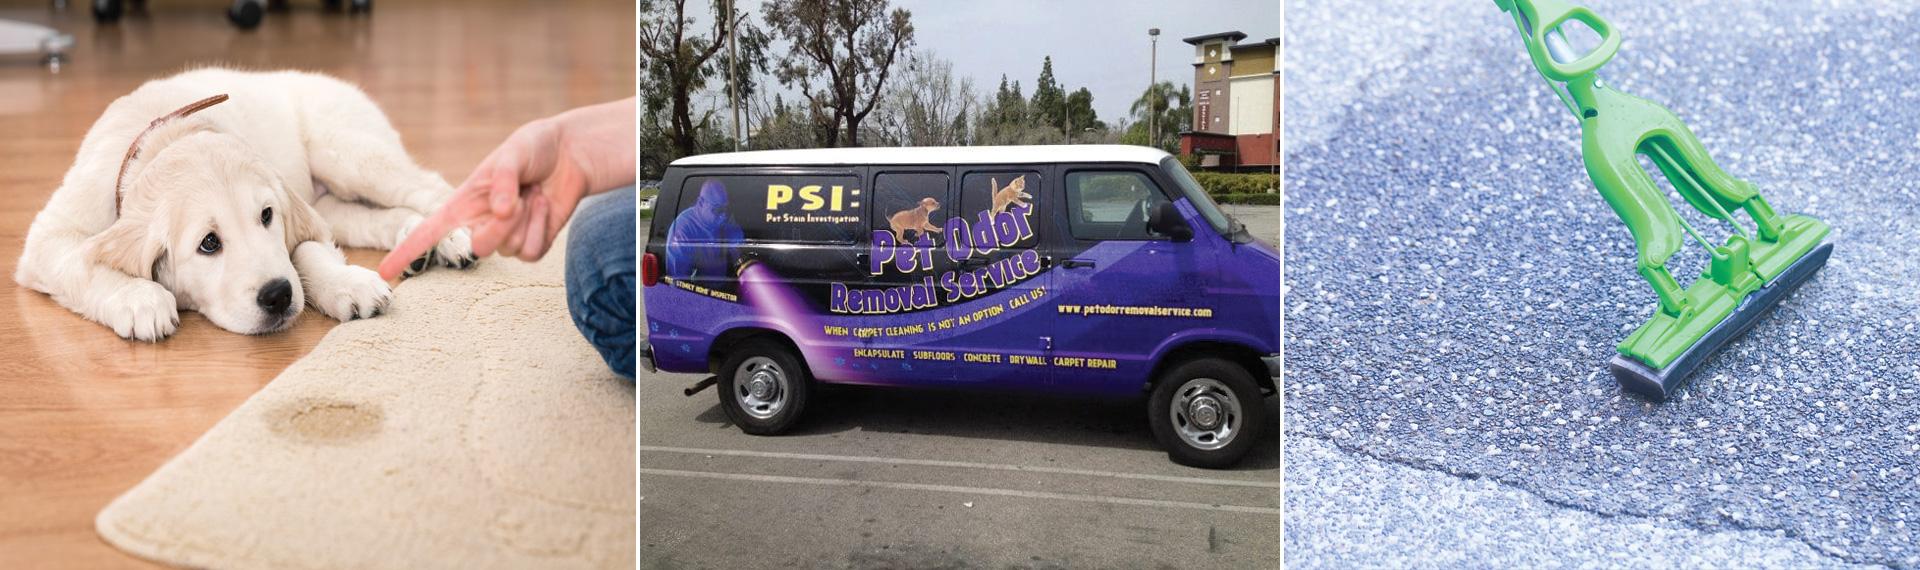 Pet Odor Removal Service Stanton CA